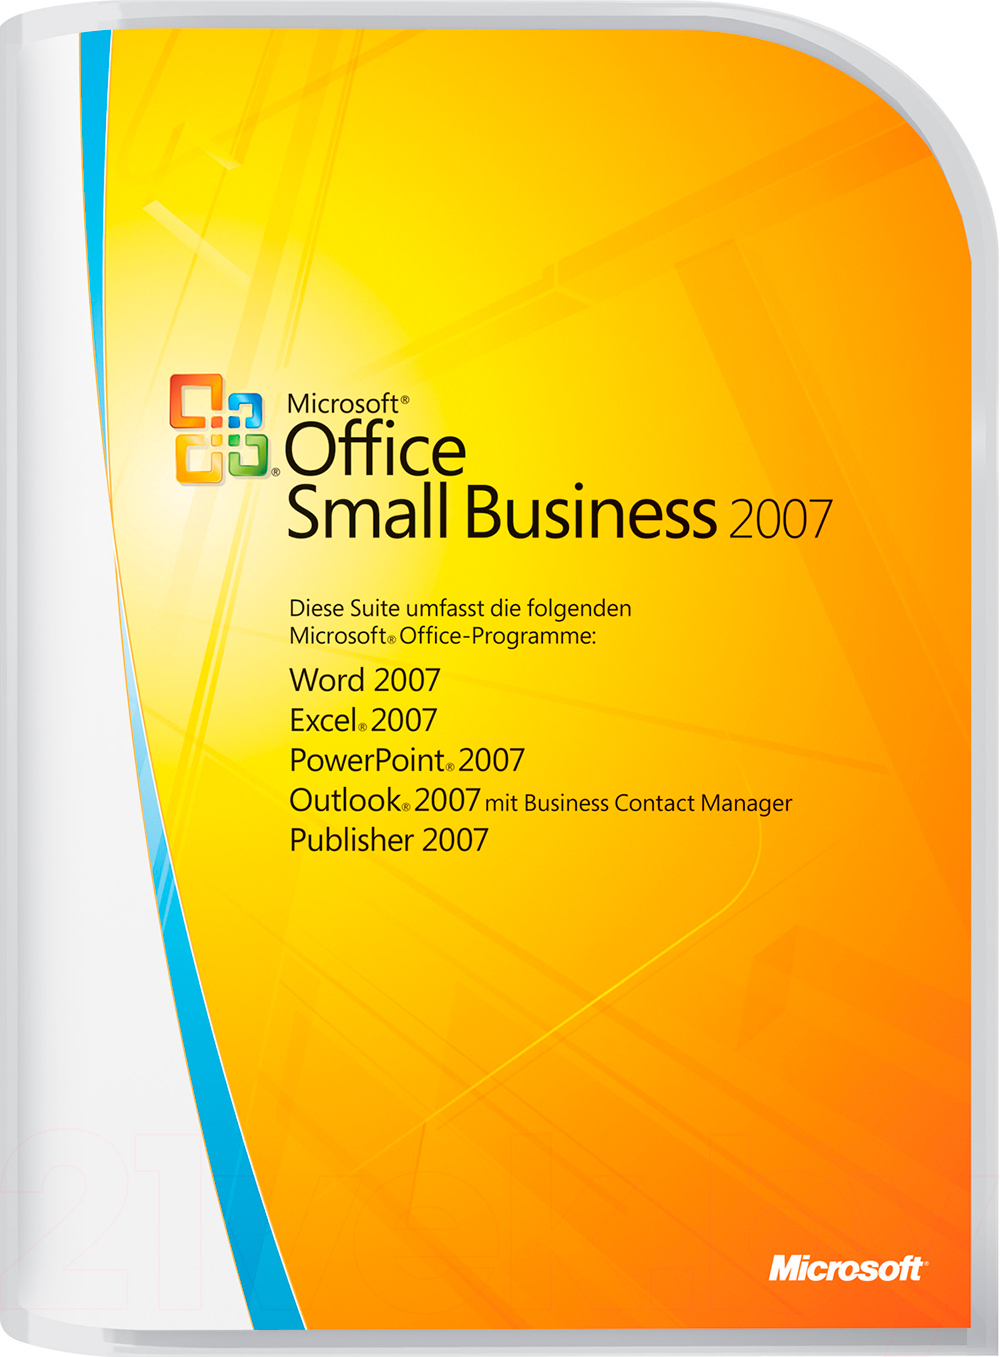 Office Small Business 2007 Win32 Ru 1pk (9QA-01535) 21vek.by 1691000.000